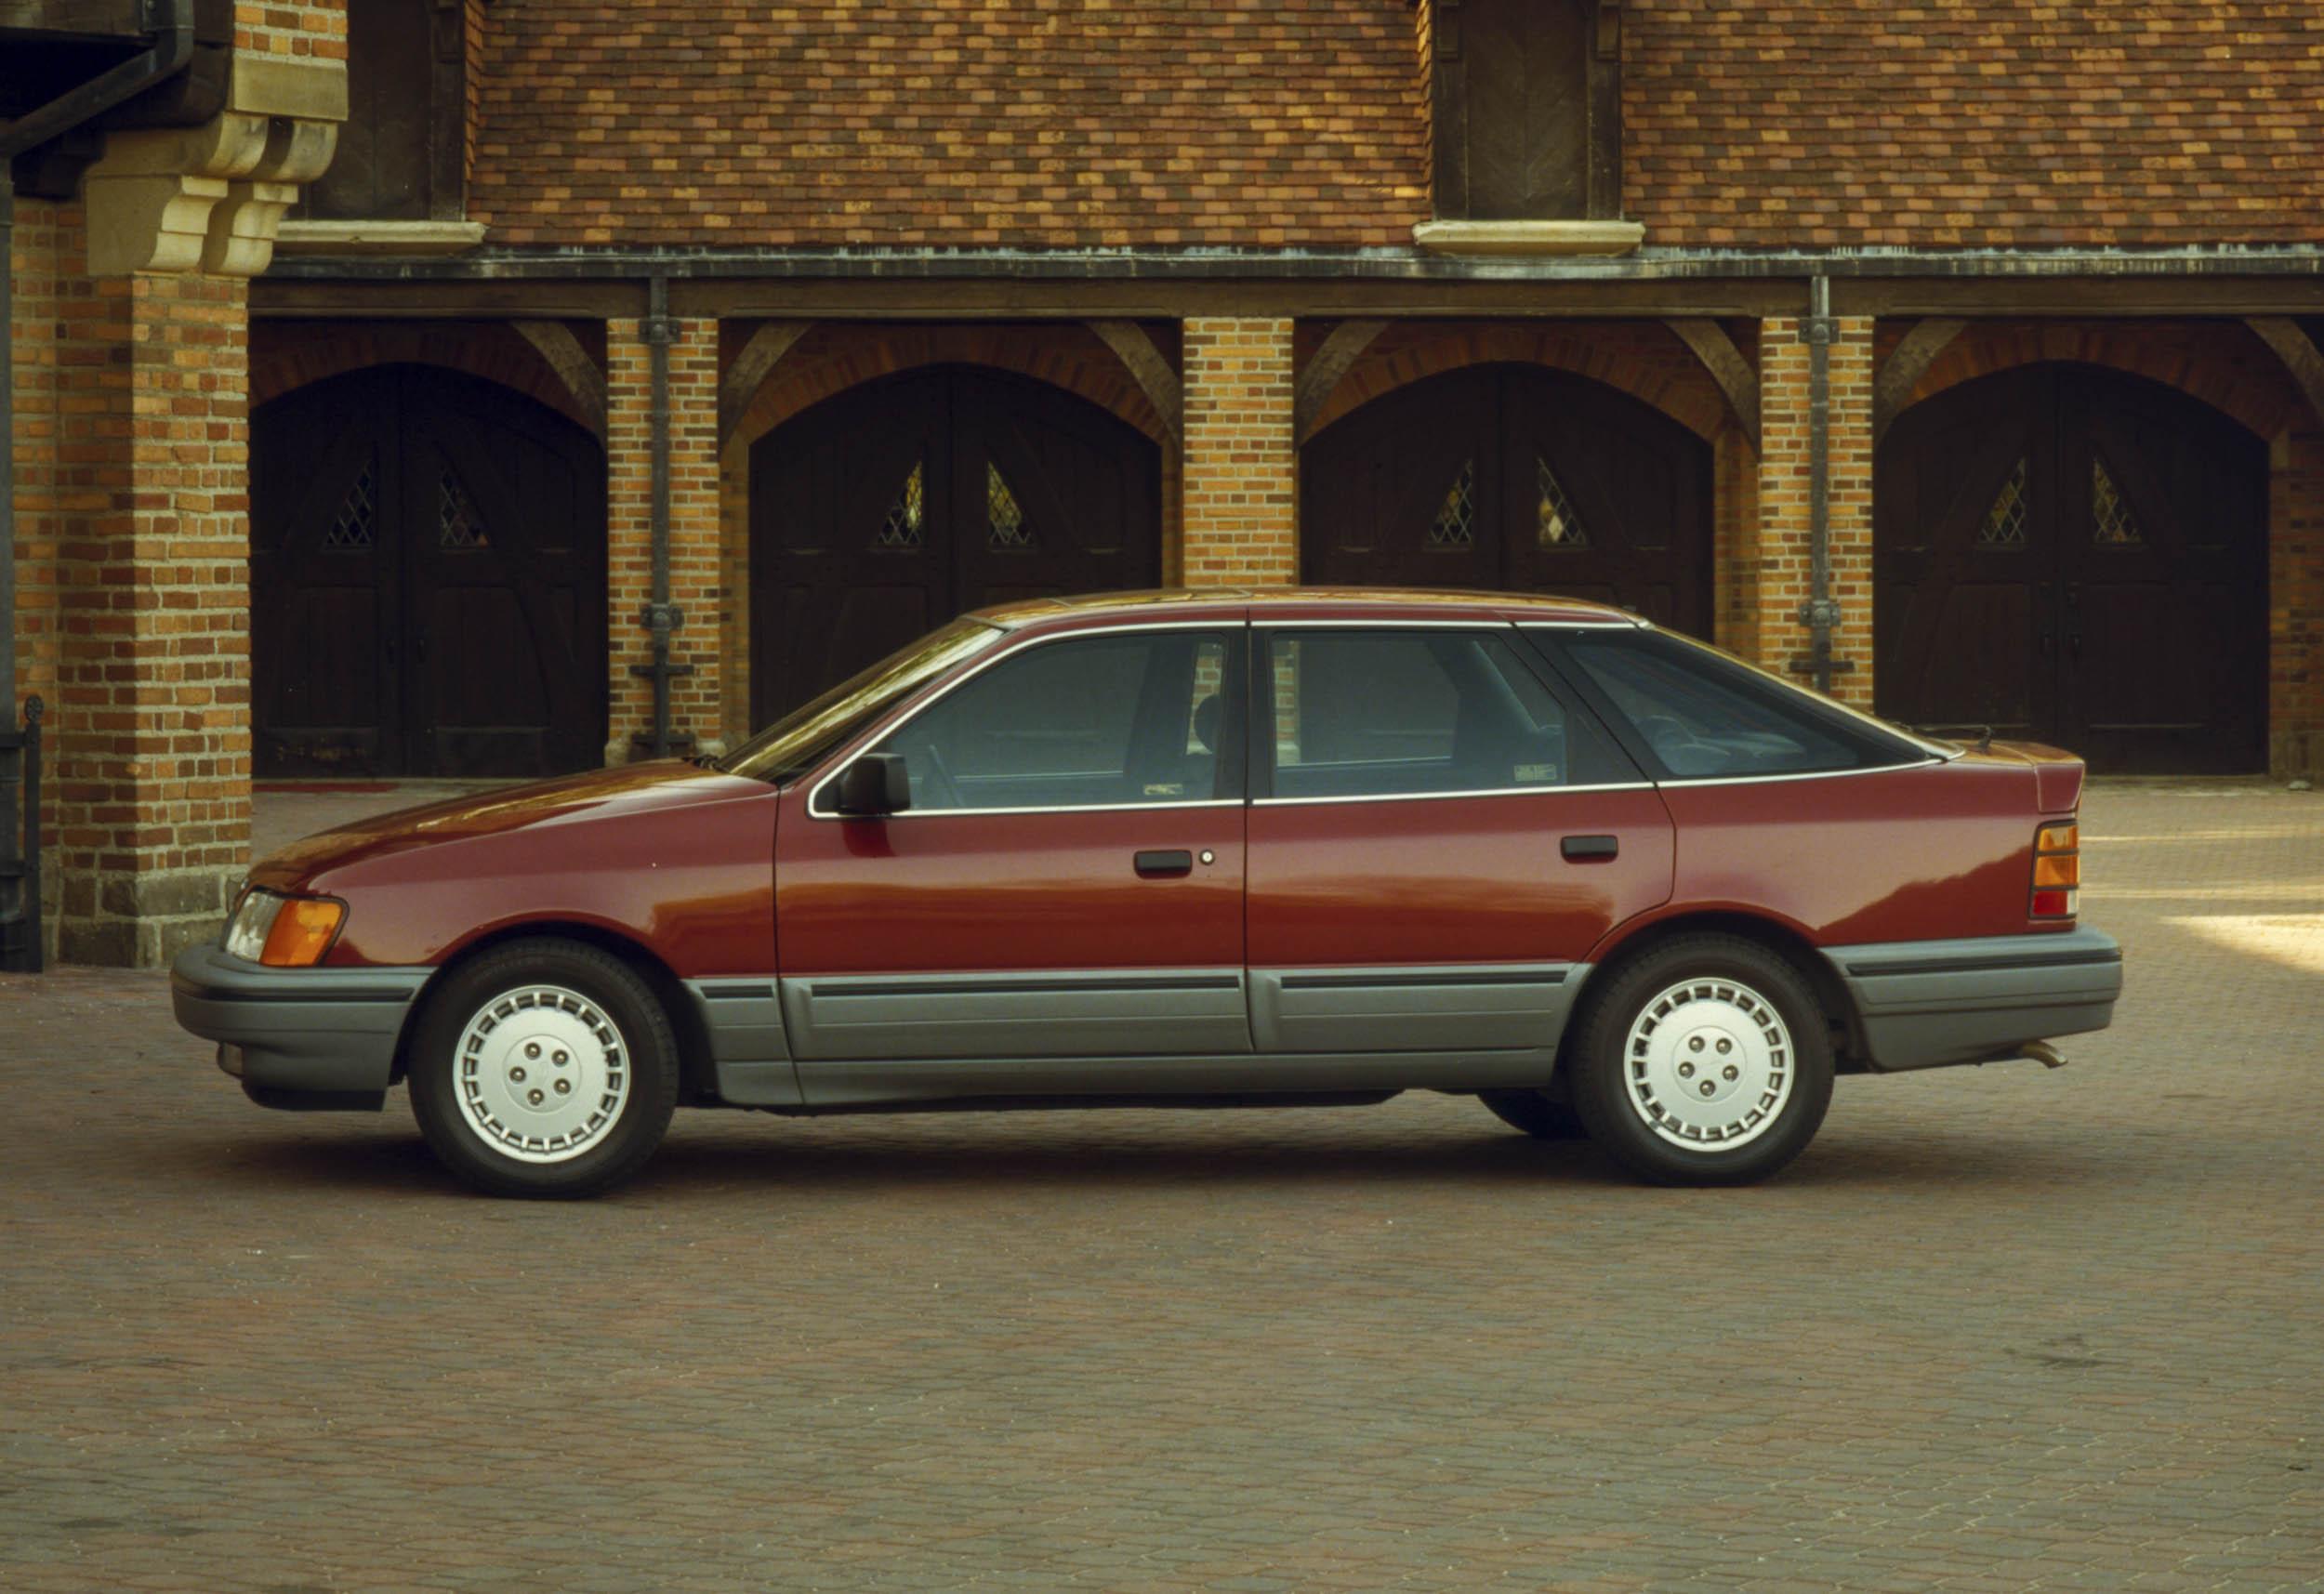 1988 Merkur Scorpio profile